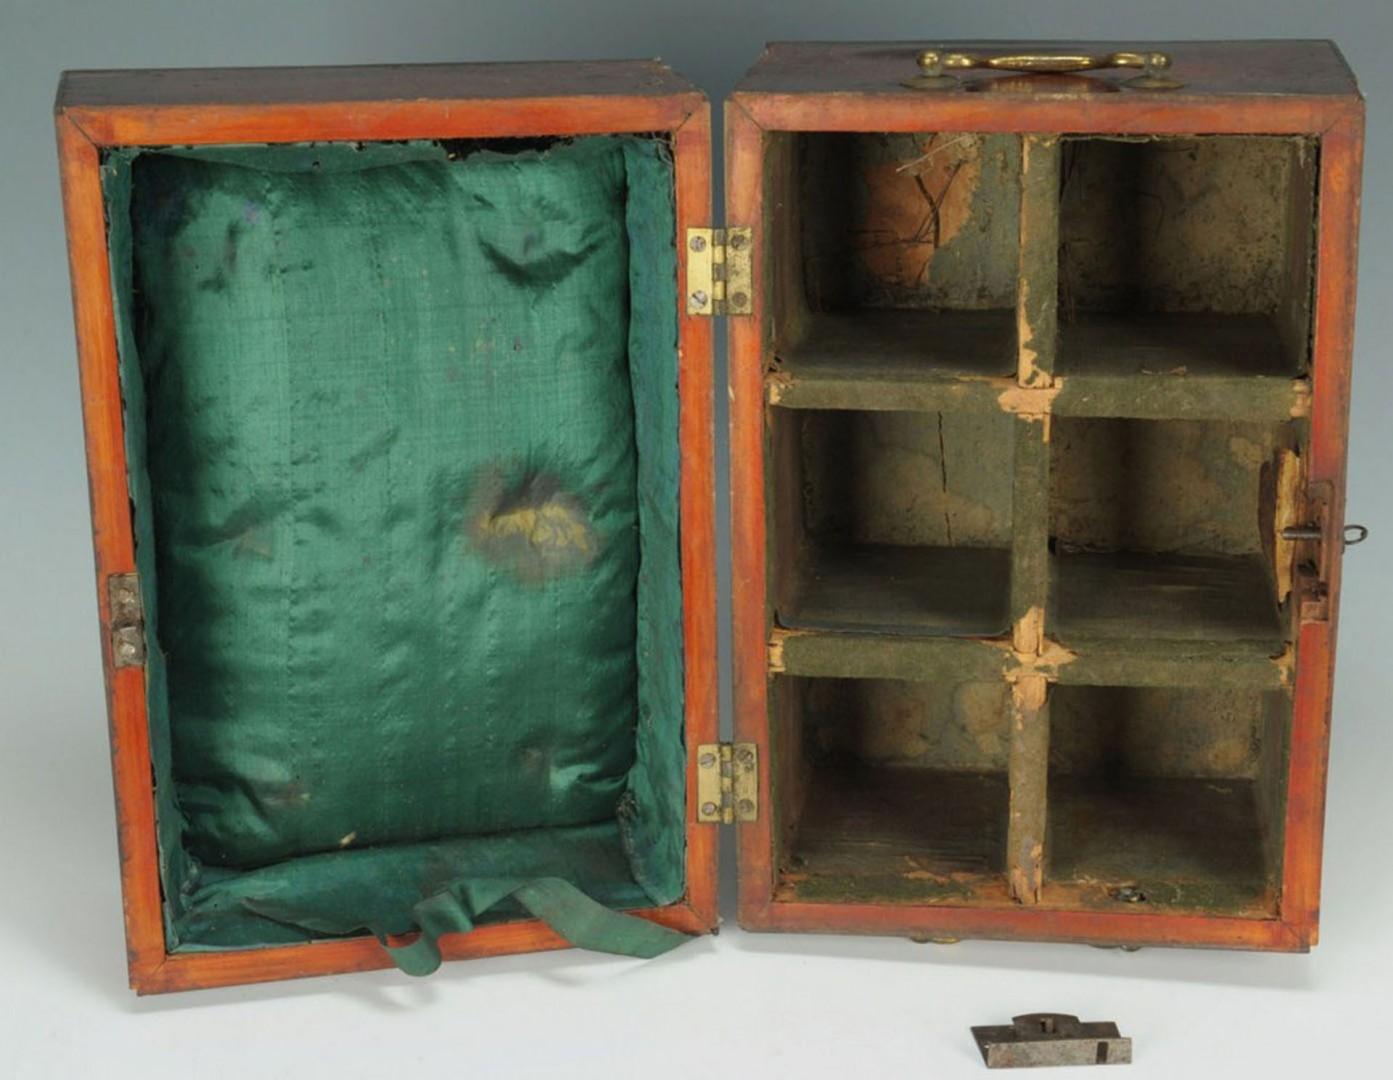 Lot 2872362: 2 English Boxes, Bottle & Document